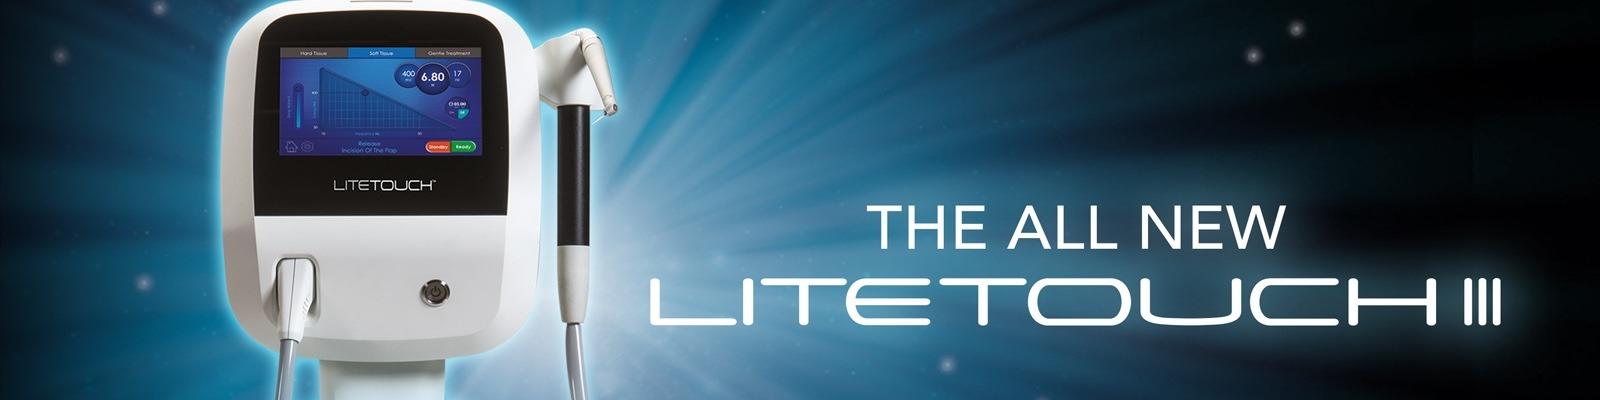 LiteTouch III Er:YAG Laser